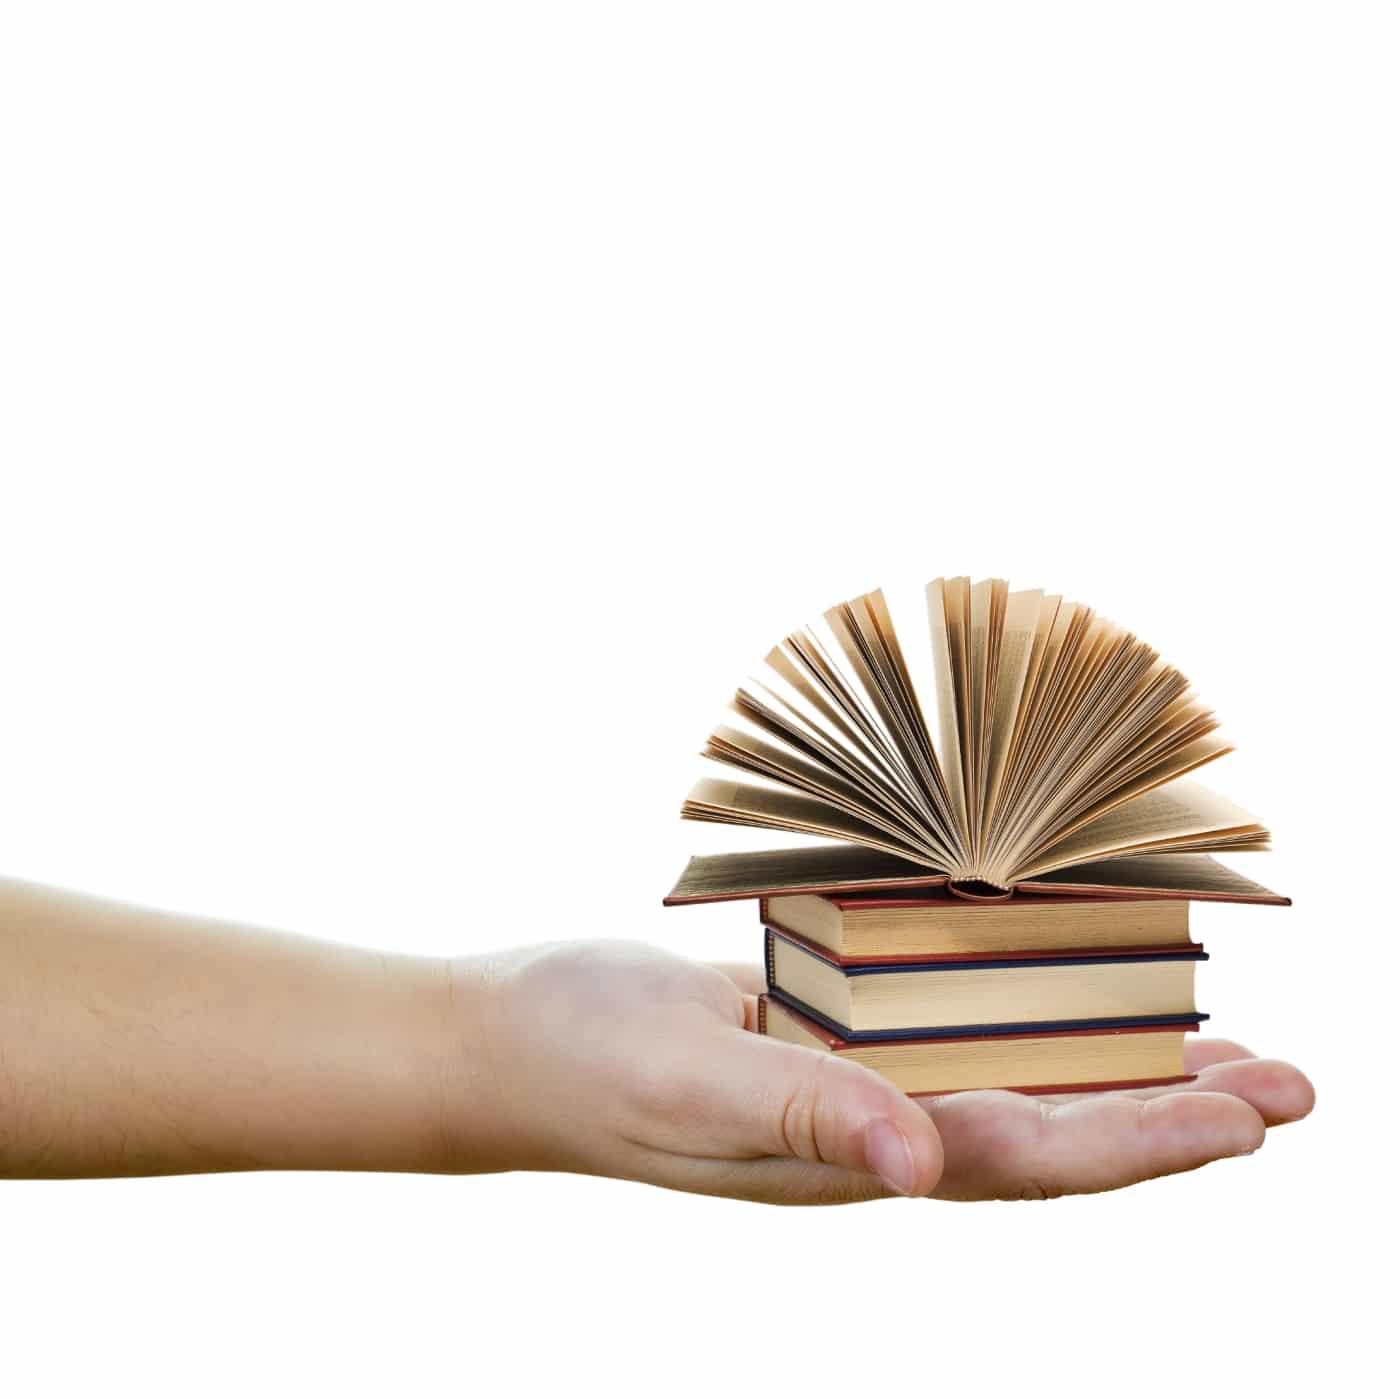 tiny book providing big knowledge, gillian lana